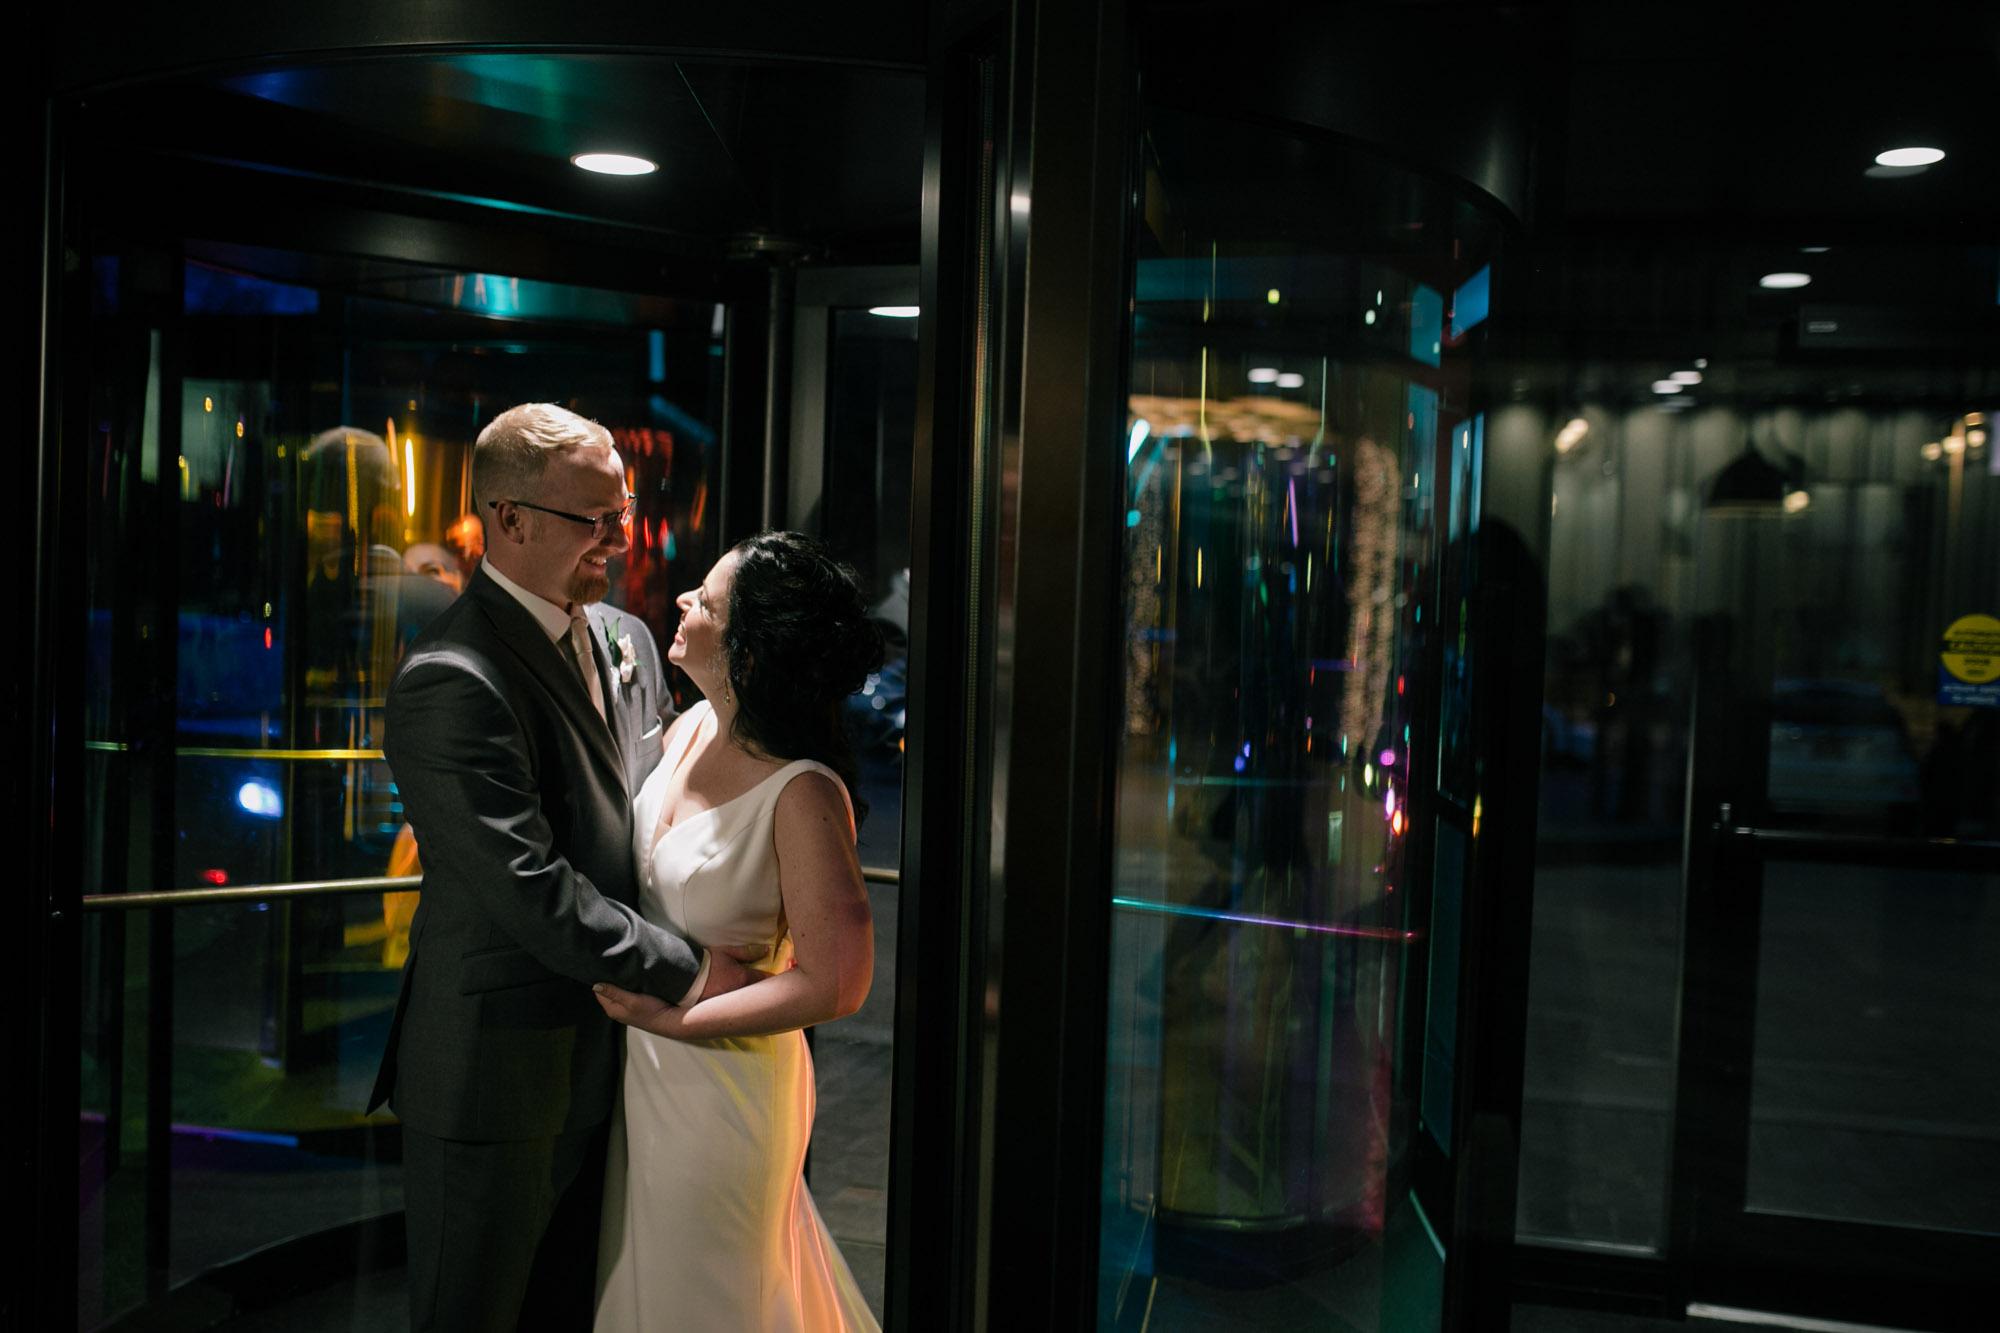 renaissance-hotel-toledo-wedding-136.jpg